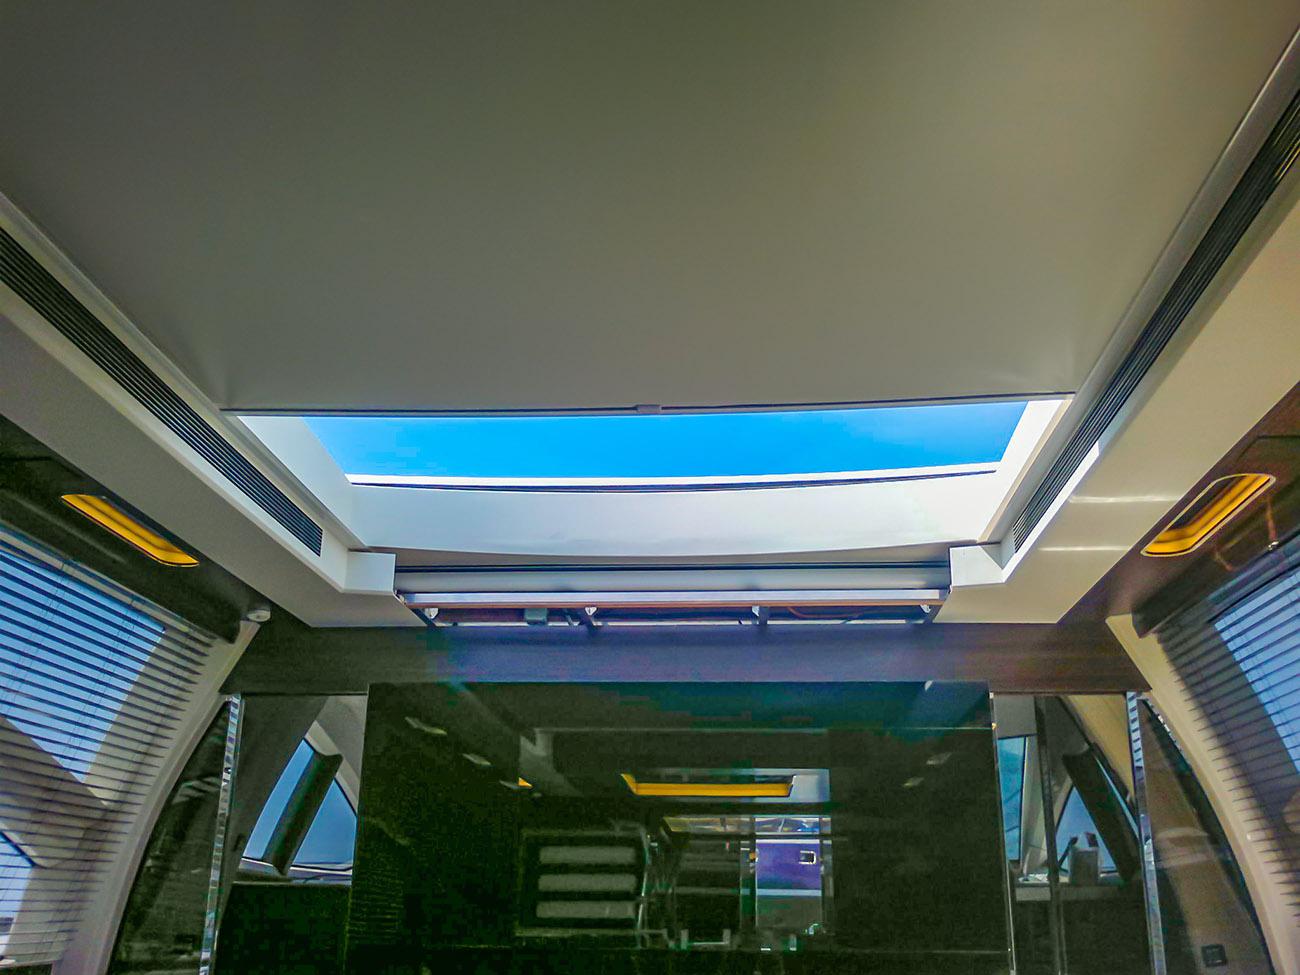 Tenda a rullo oscurante sul lucernario di uno yacht